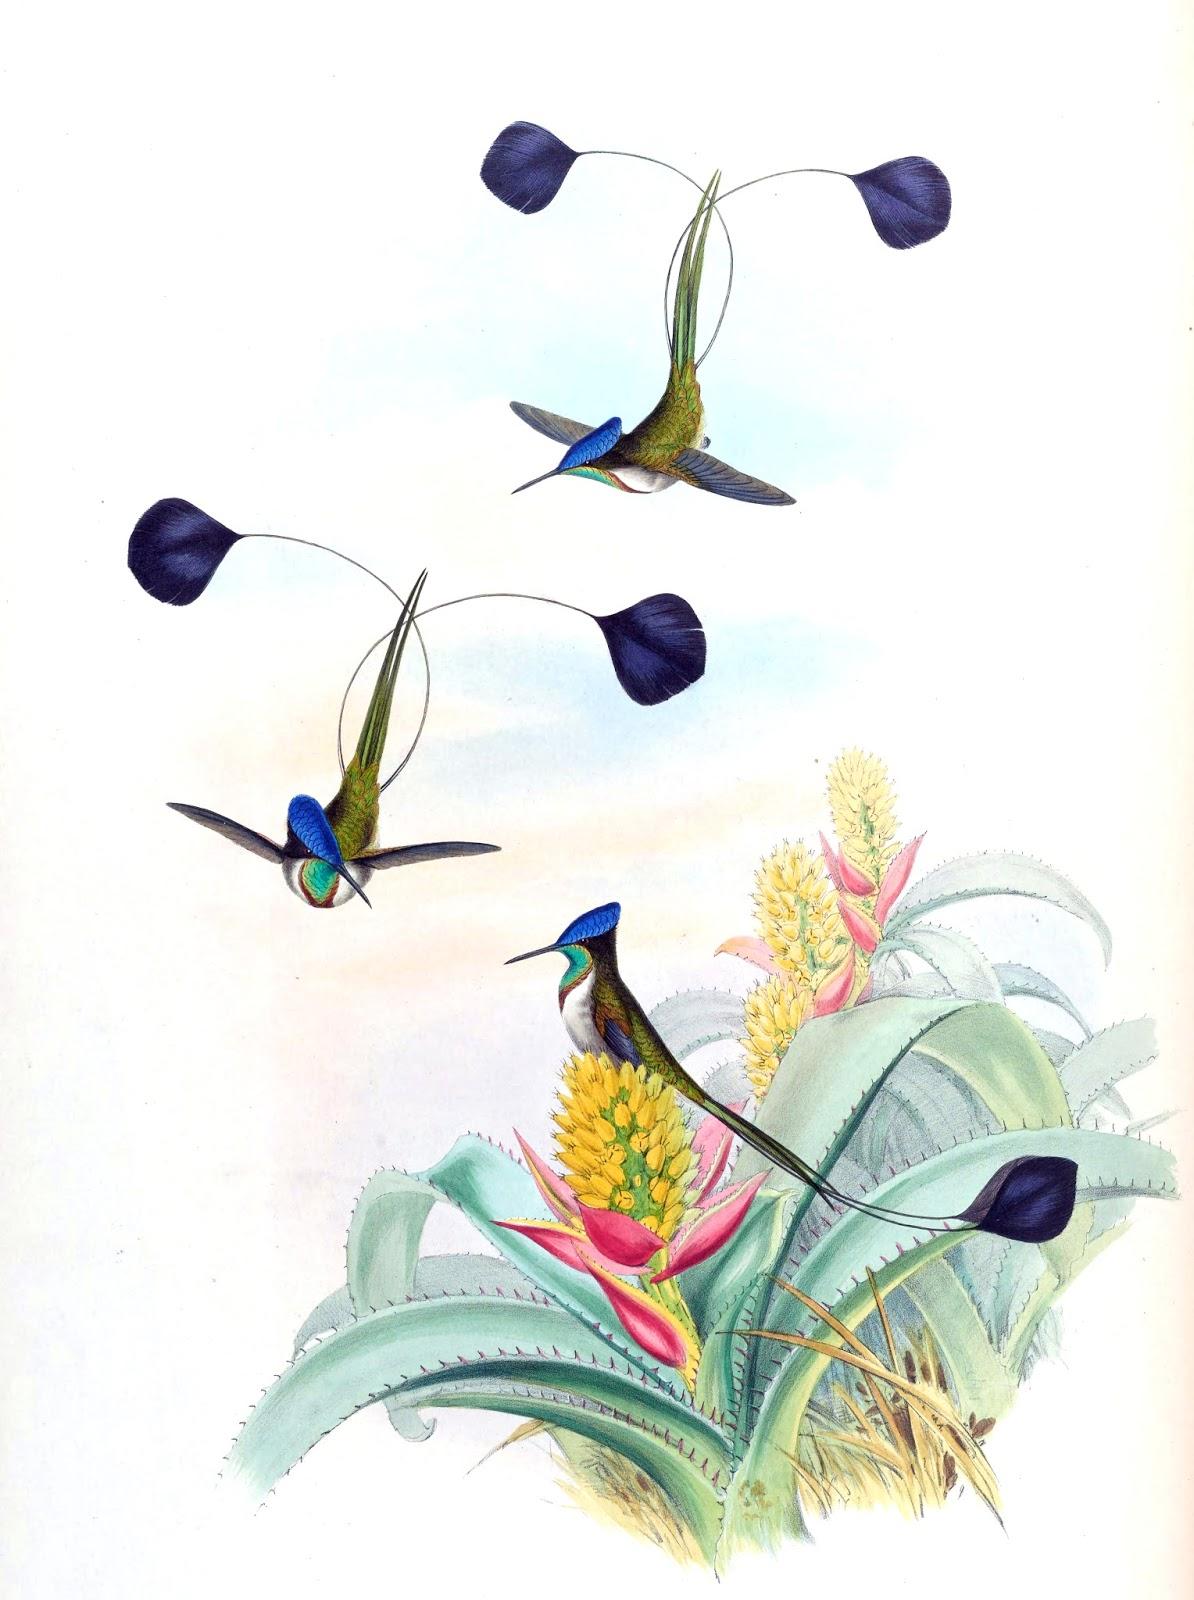 Colibri Sílfide (Loddigesia mirabilis)